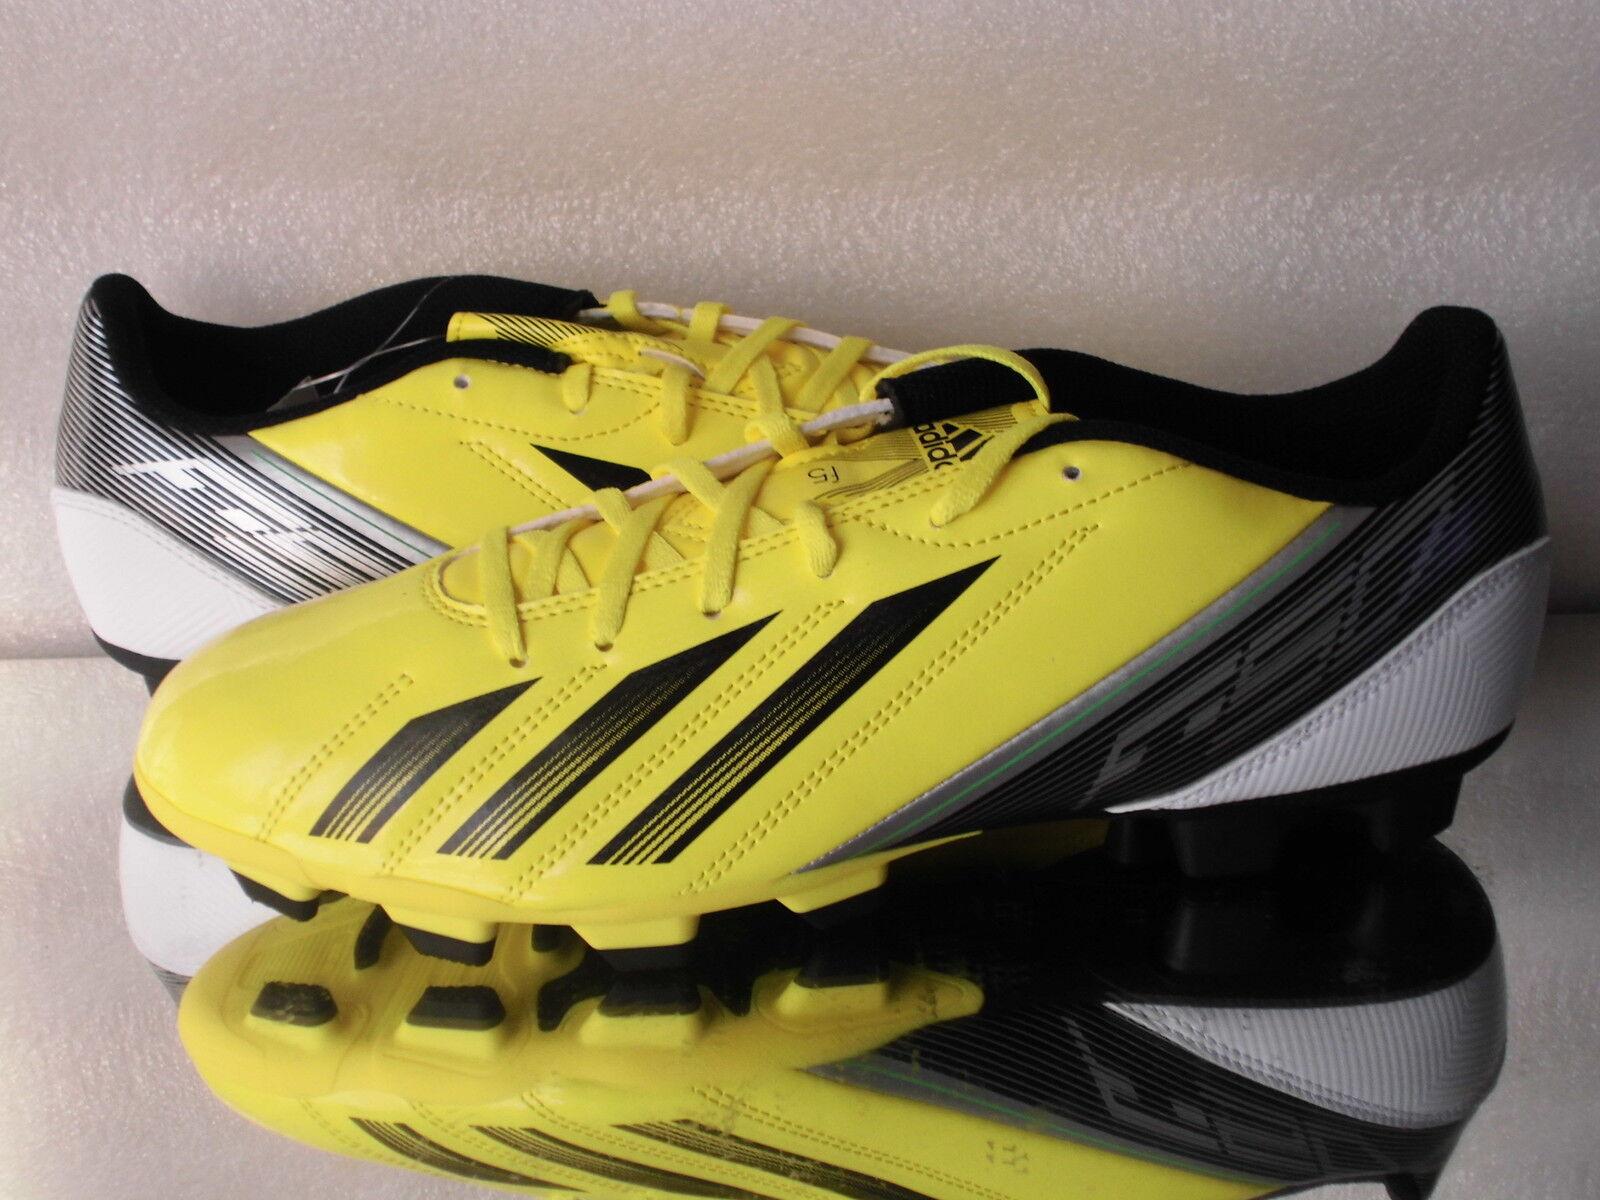 Adidas Fussballschuhe F5 TRX FG G65423 yellow black Gr 39-47 Neu